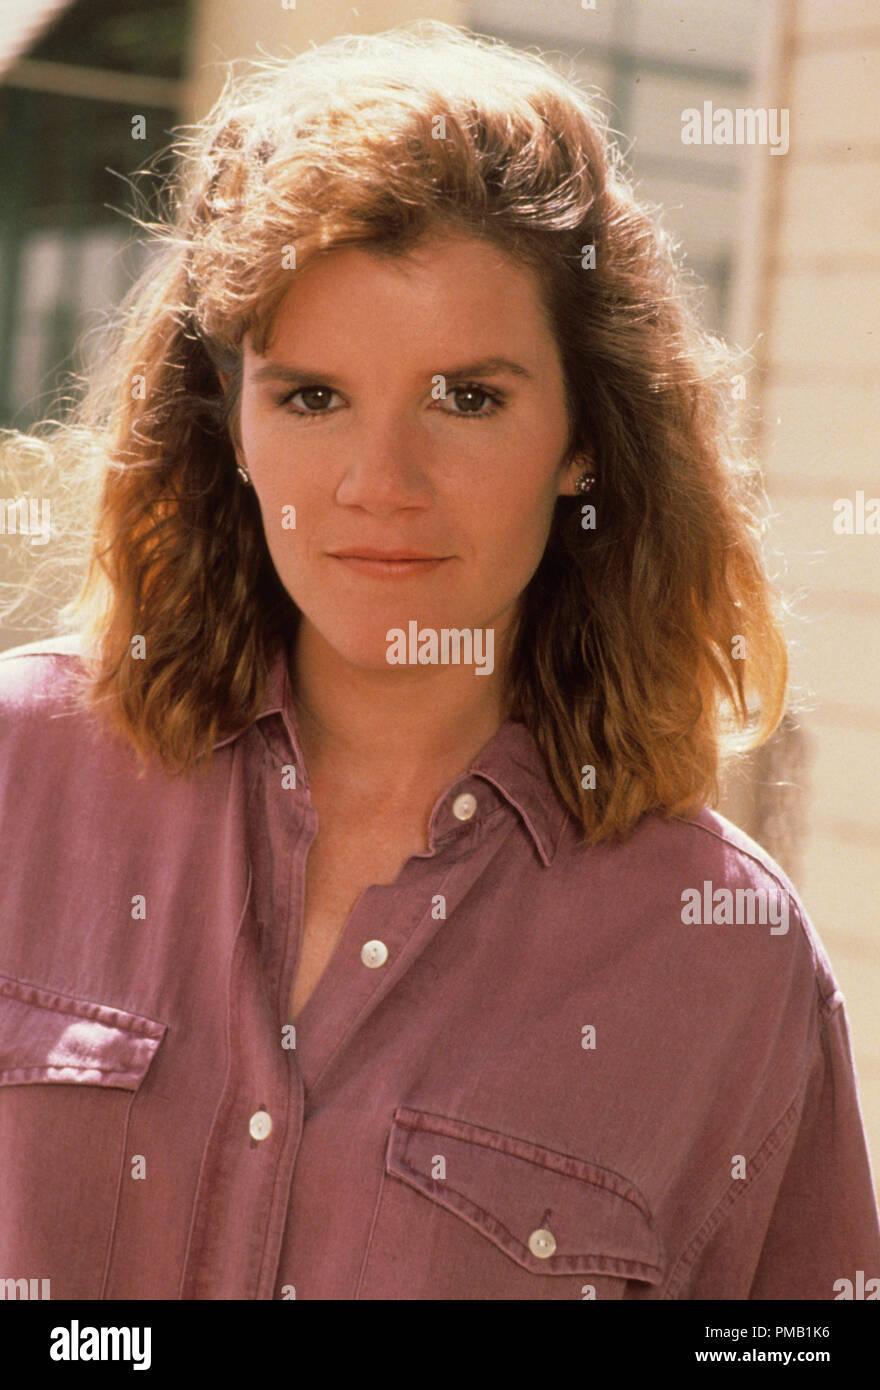 24. Sandra Bullock photo